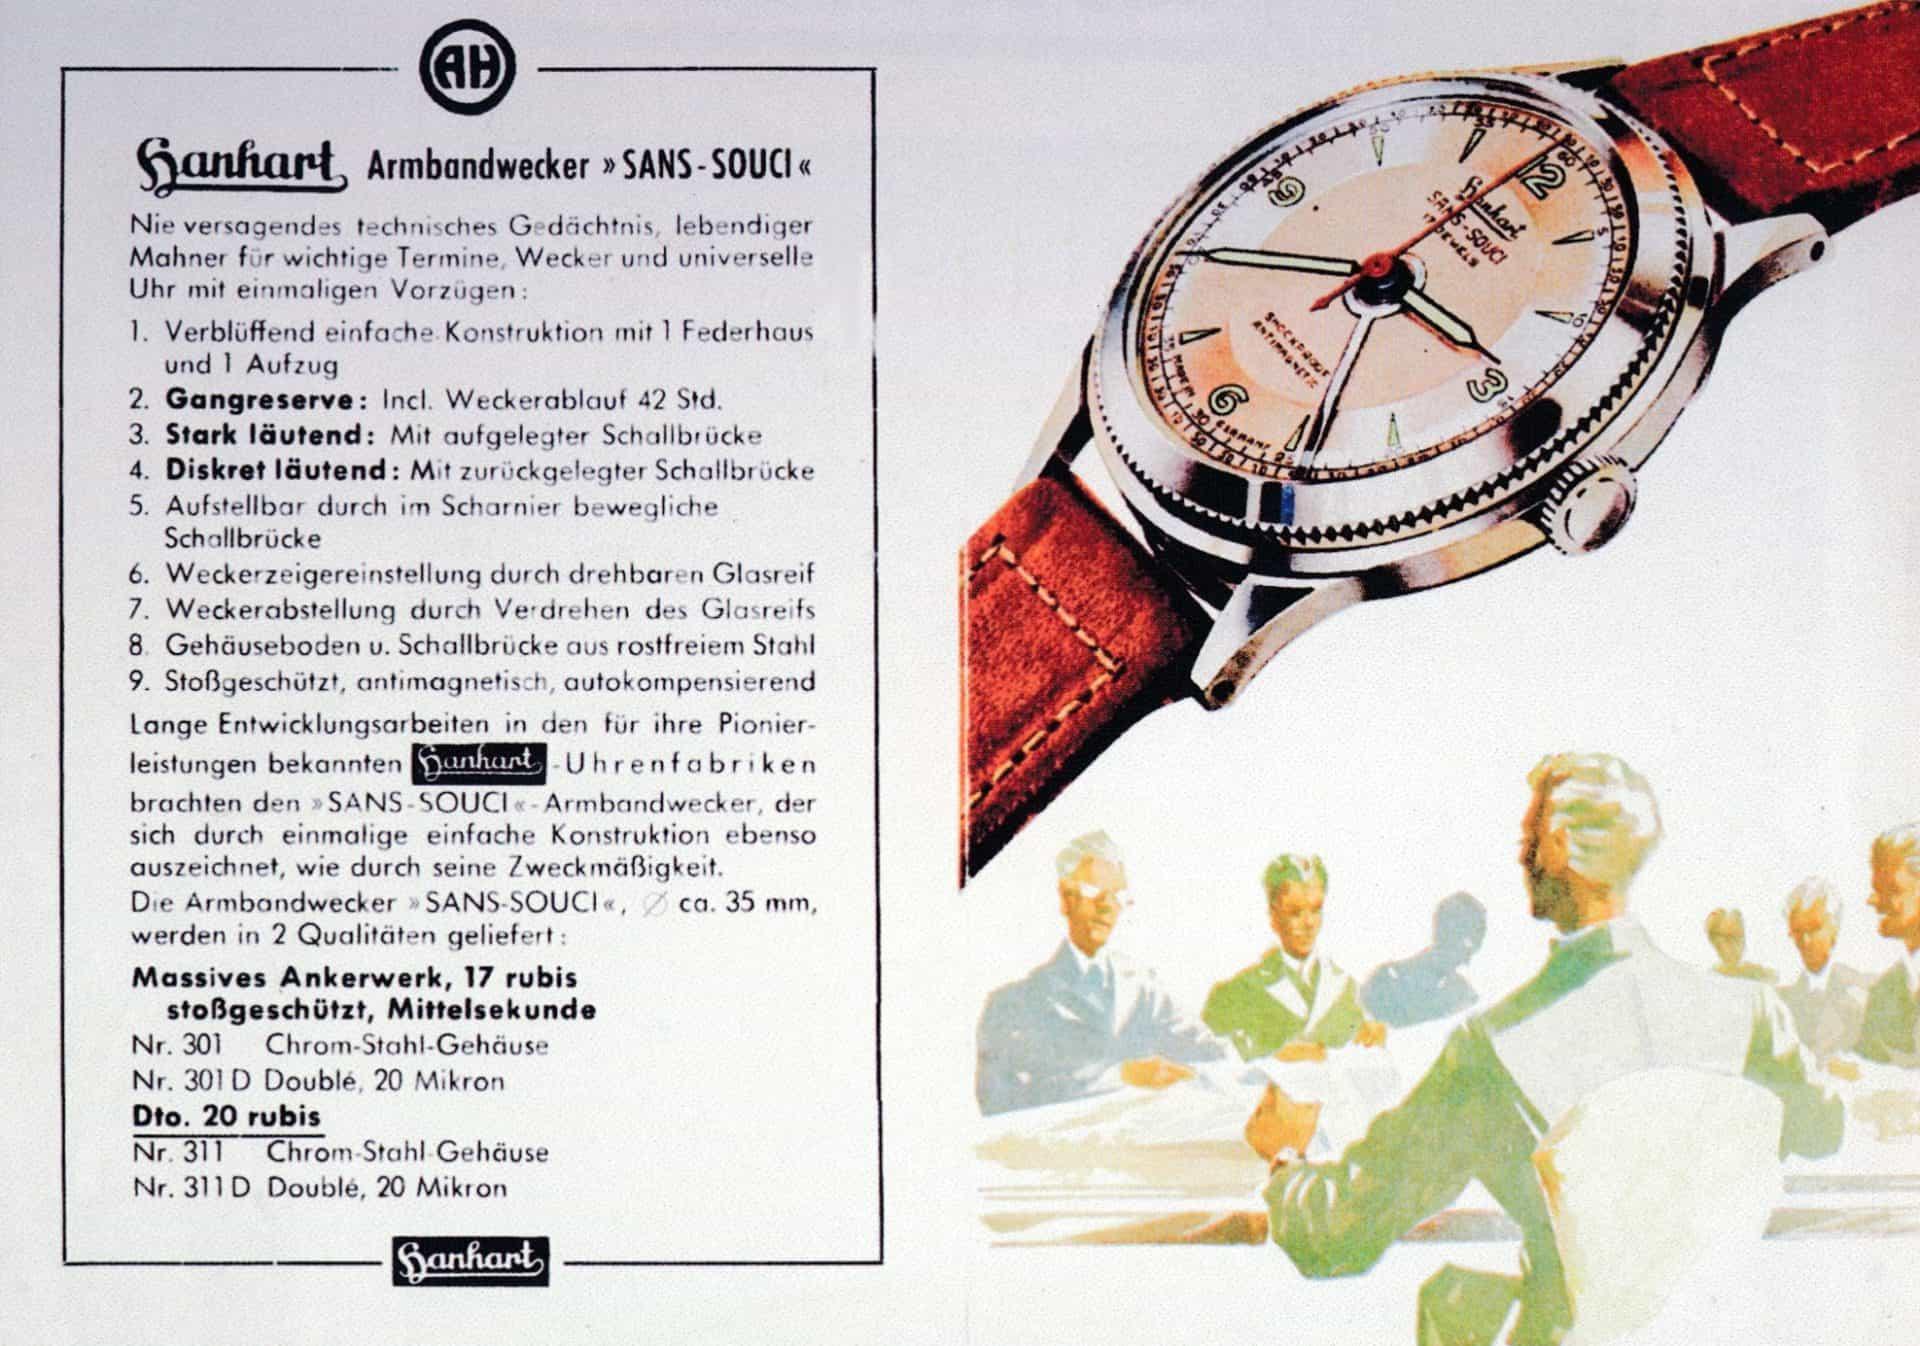 Hanhart Sans-Souci Armbandwecker, 1951